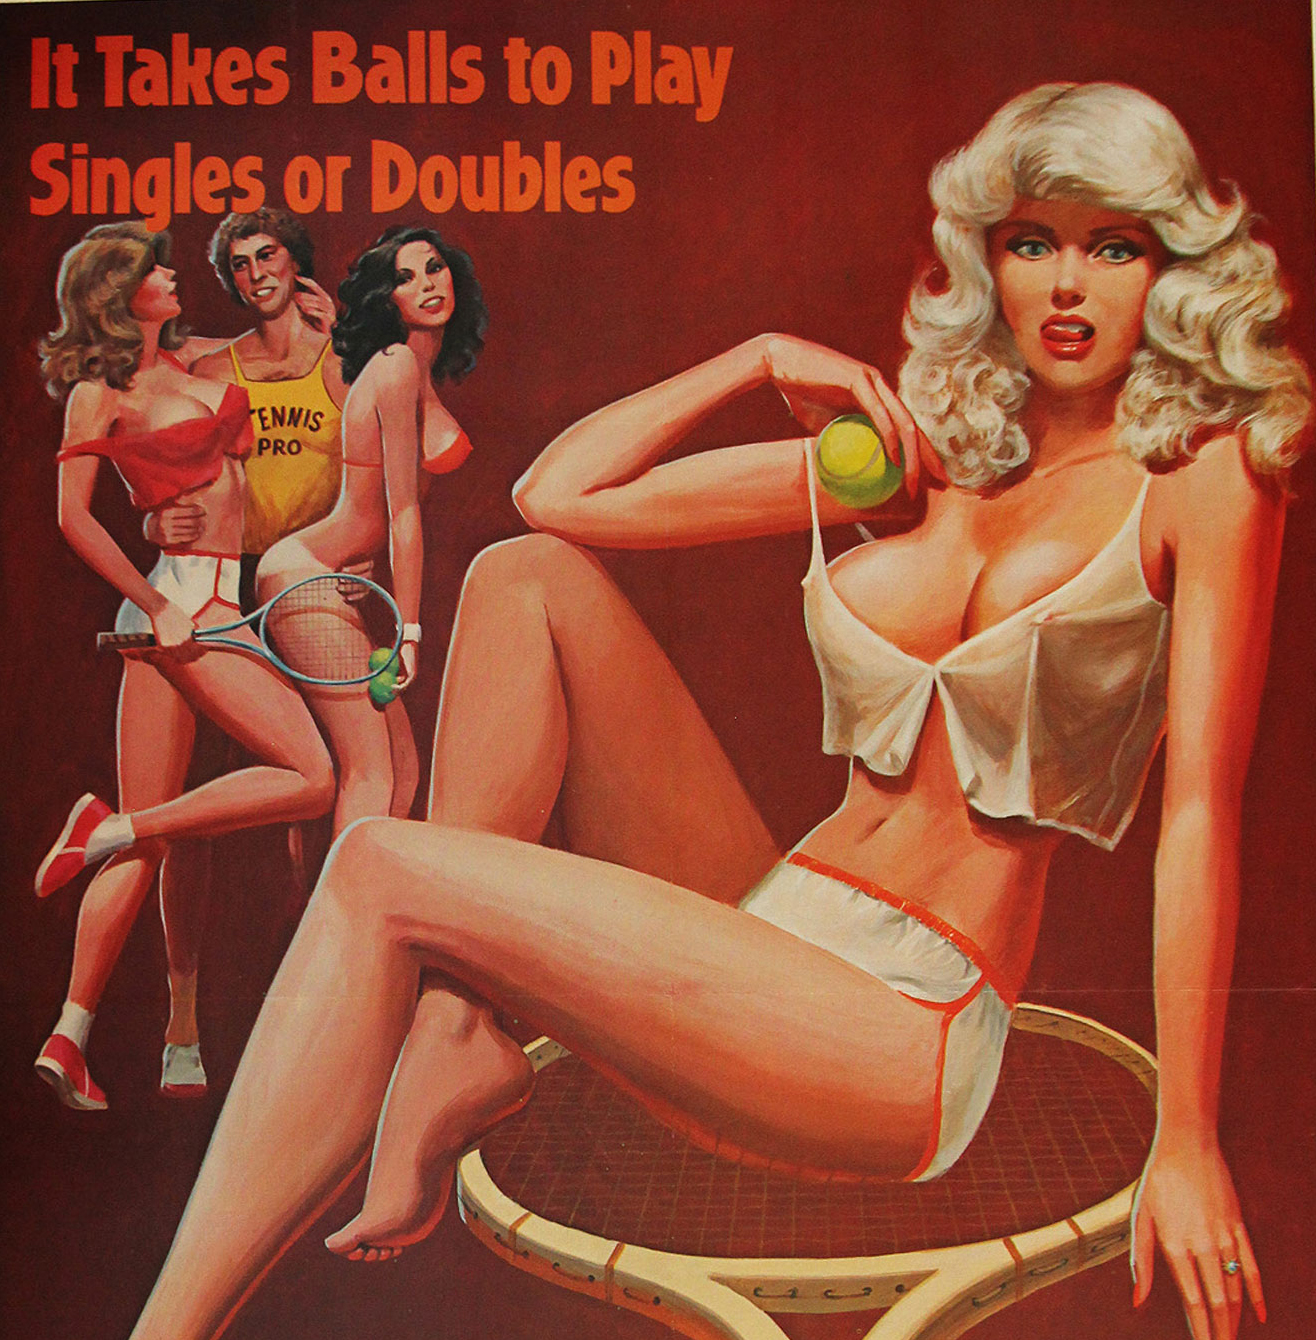 Retro-plakaty-promujace-filmy-porno